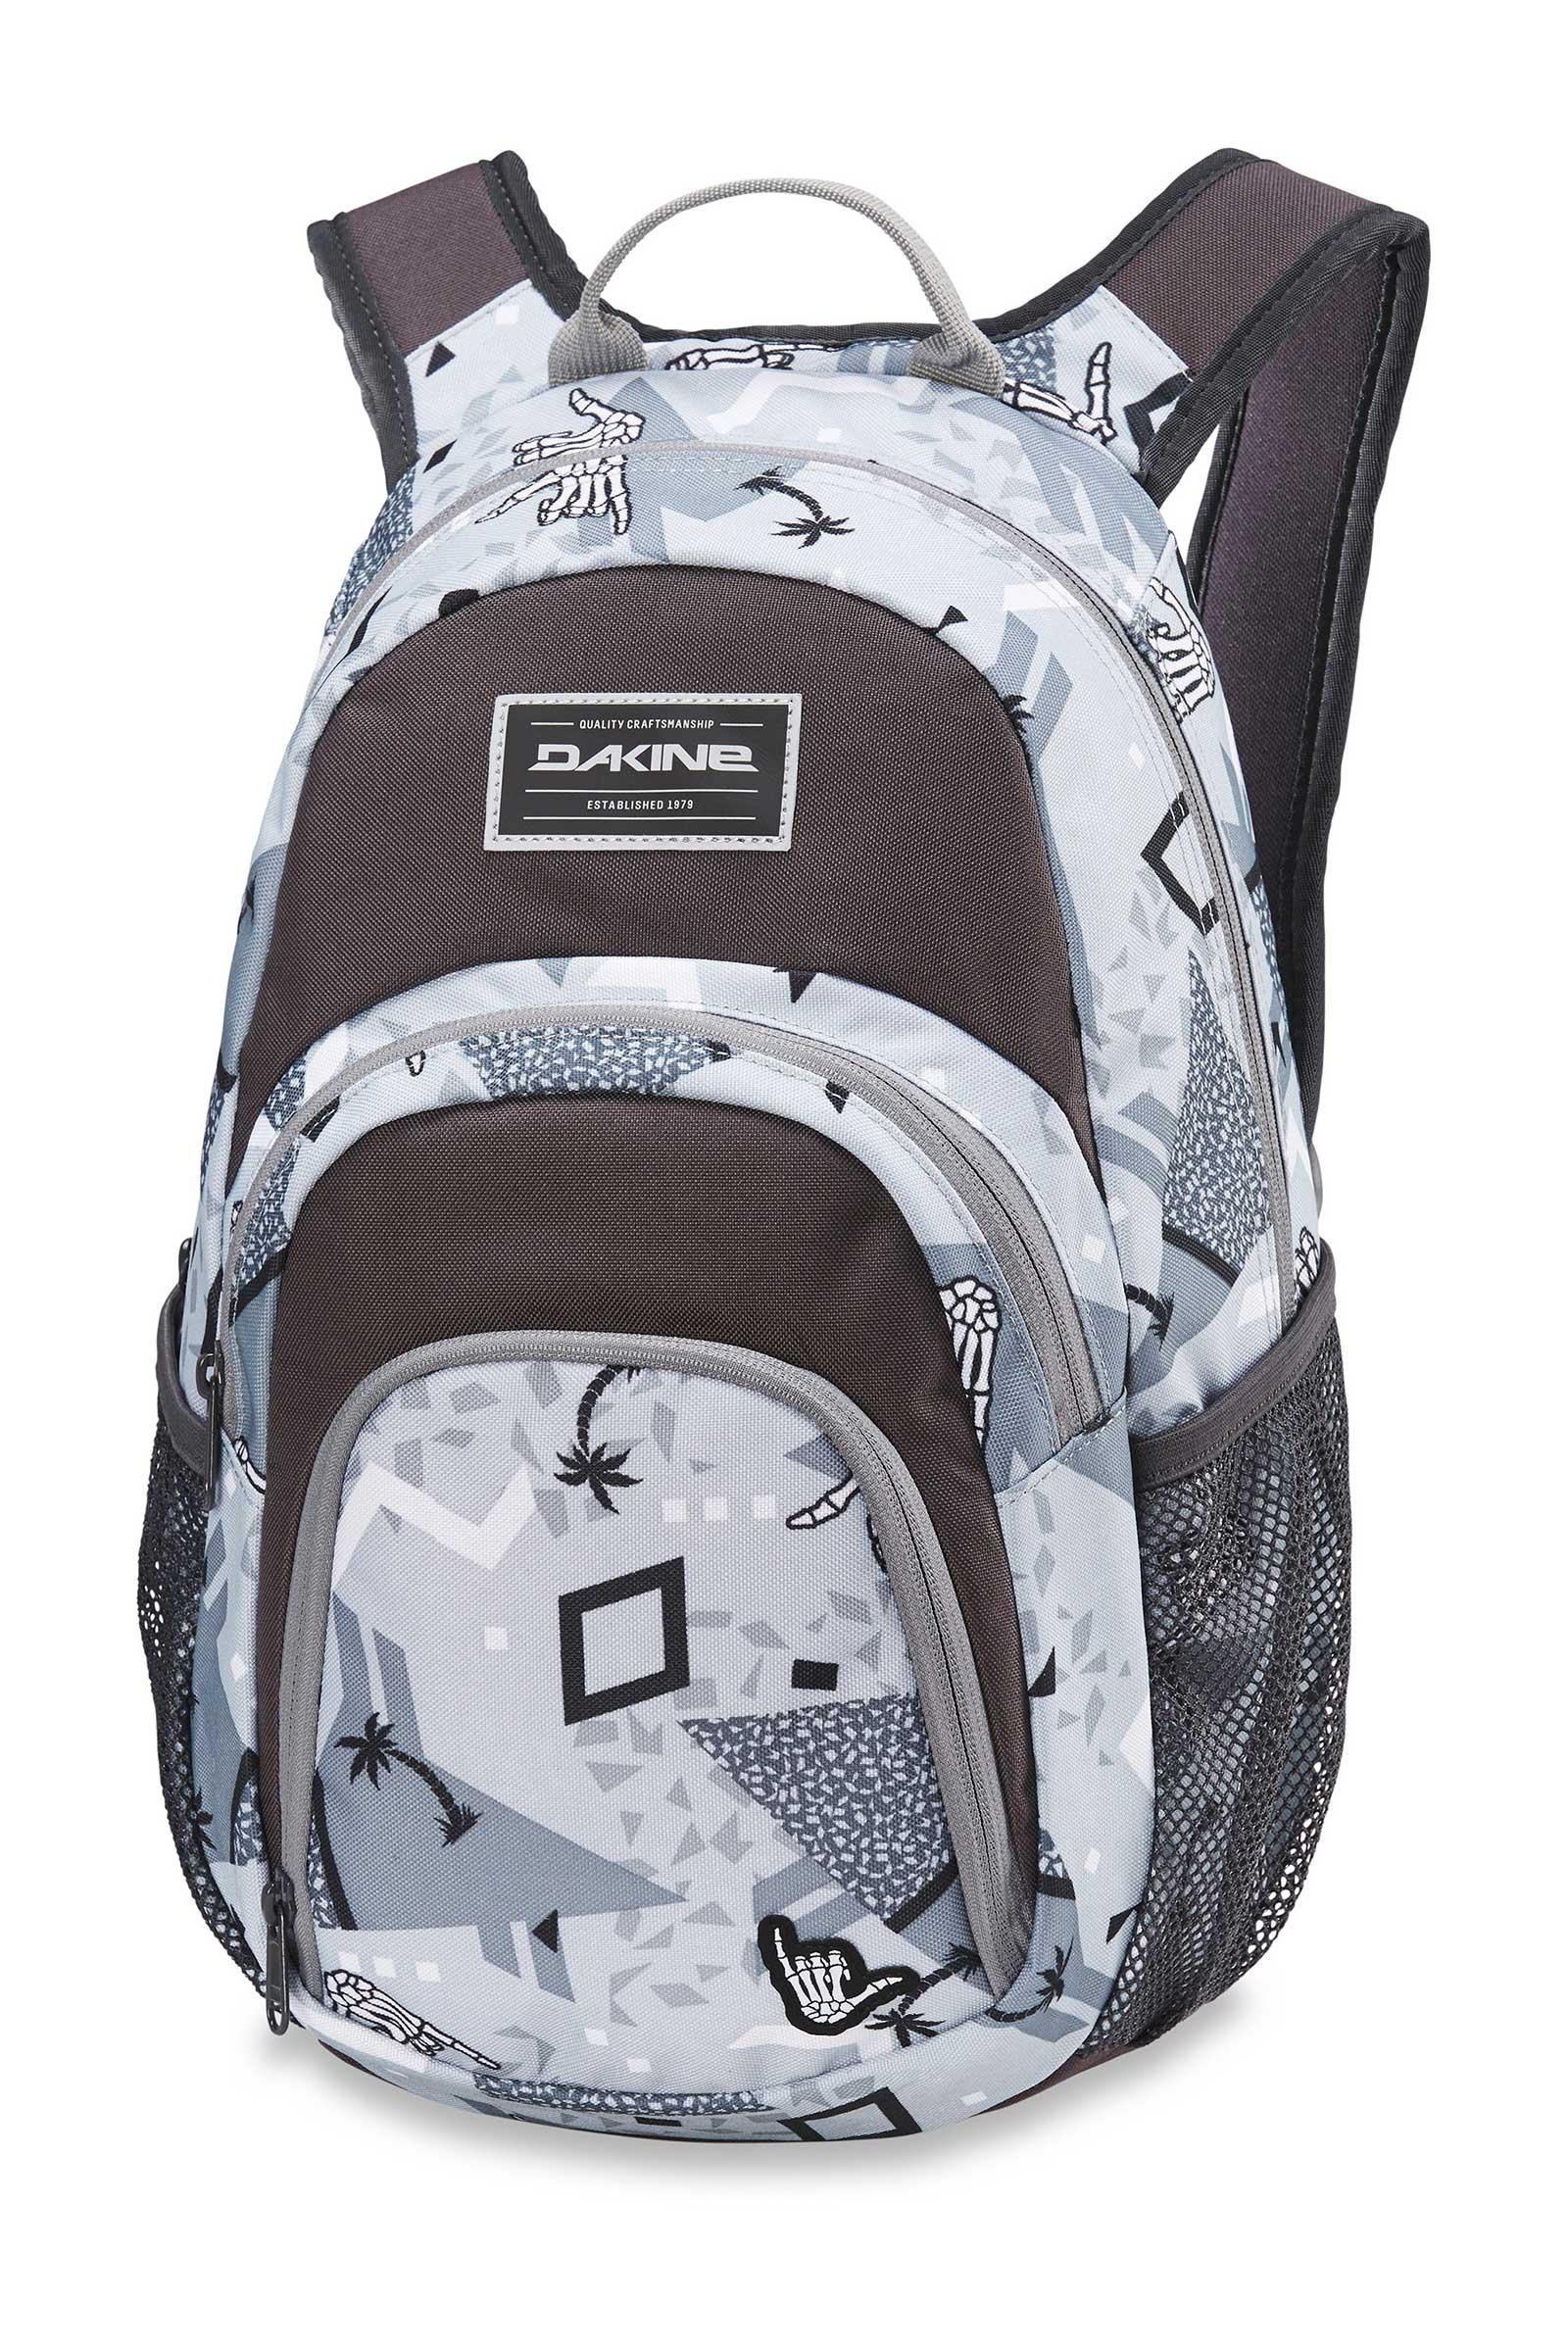 Dakine Backpack Campus Mini 18L Party Palm     Backpacks   The Board  Basement f45b2630e1